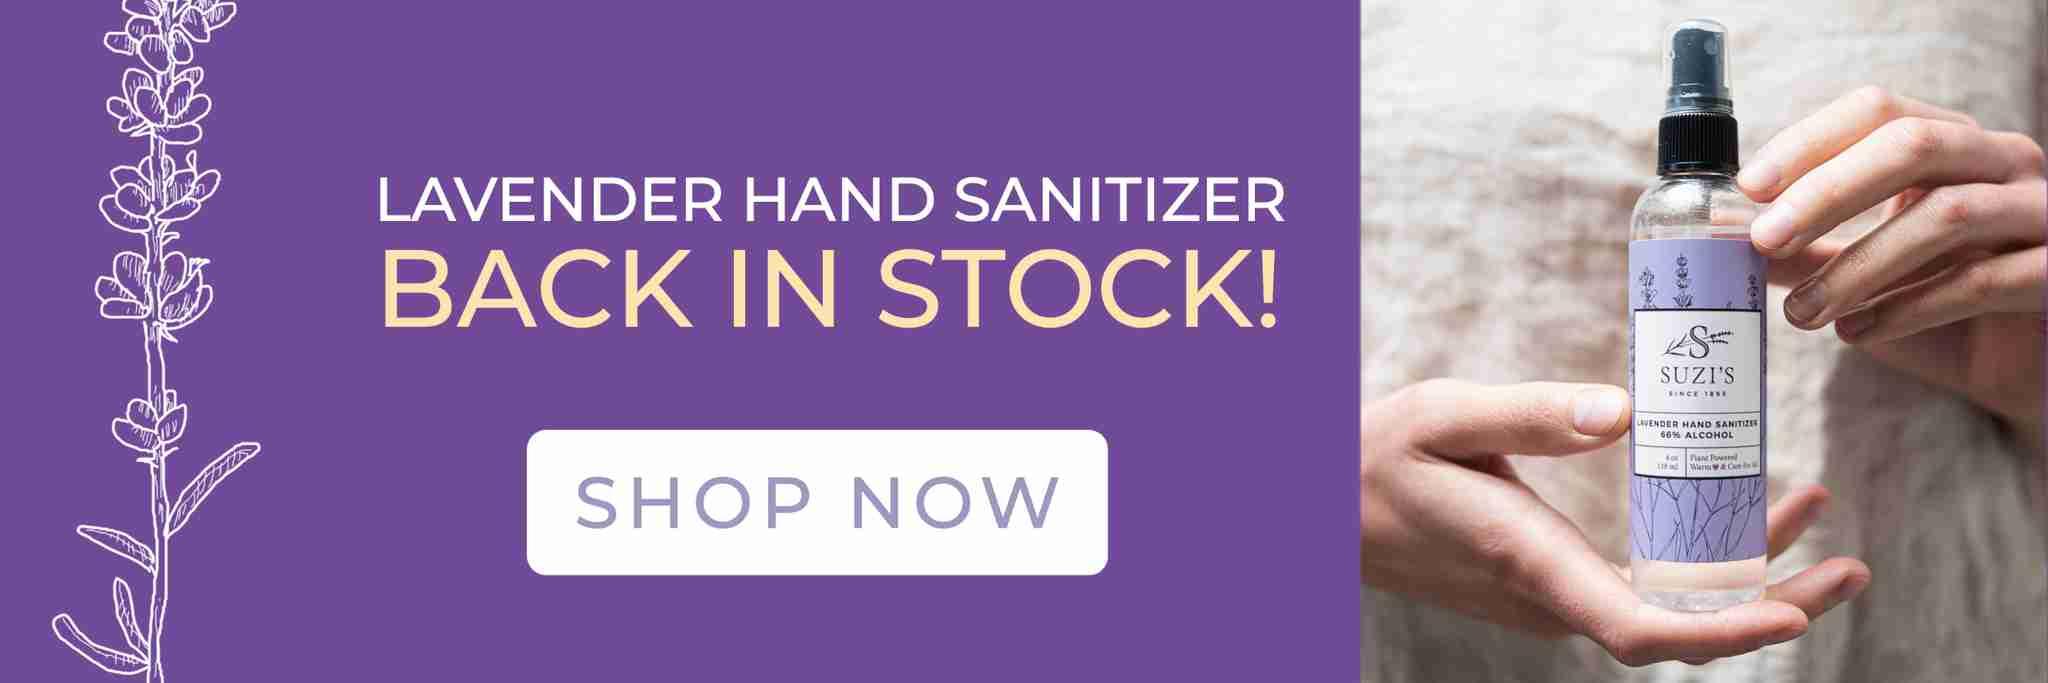 All Natural Non Drying Lavender Hand Sanitizer - Suzi's Lavender